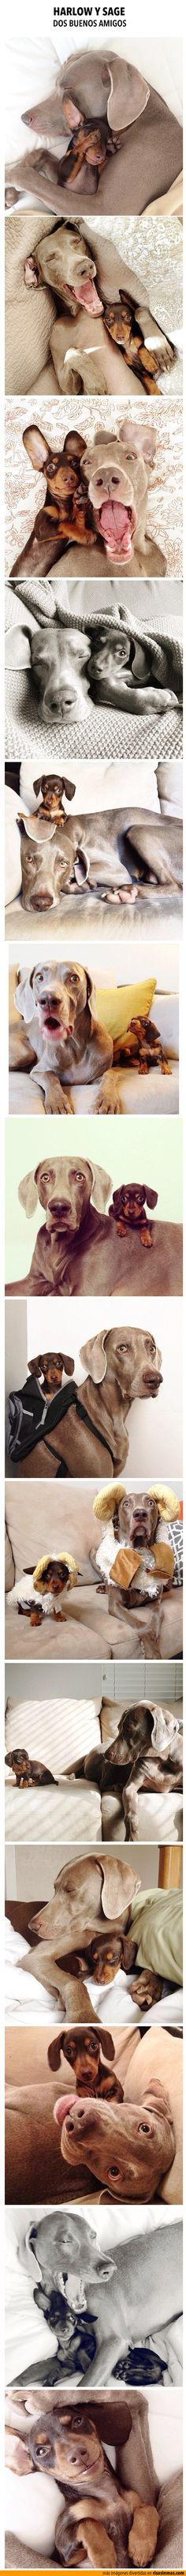 Harlow y Sage, dos buenos amigos. backpacks, anim, cutest dogs, dachshund, pet, puppi, friend, little dogs, big dogs